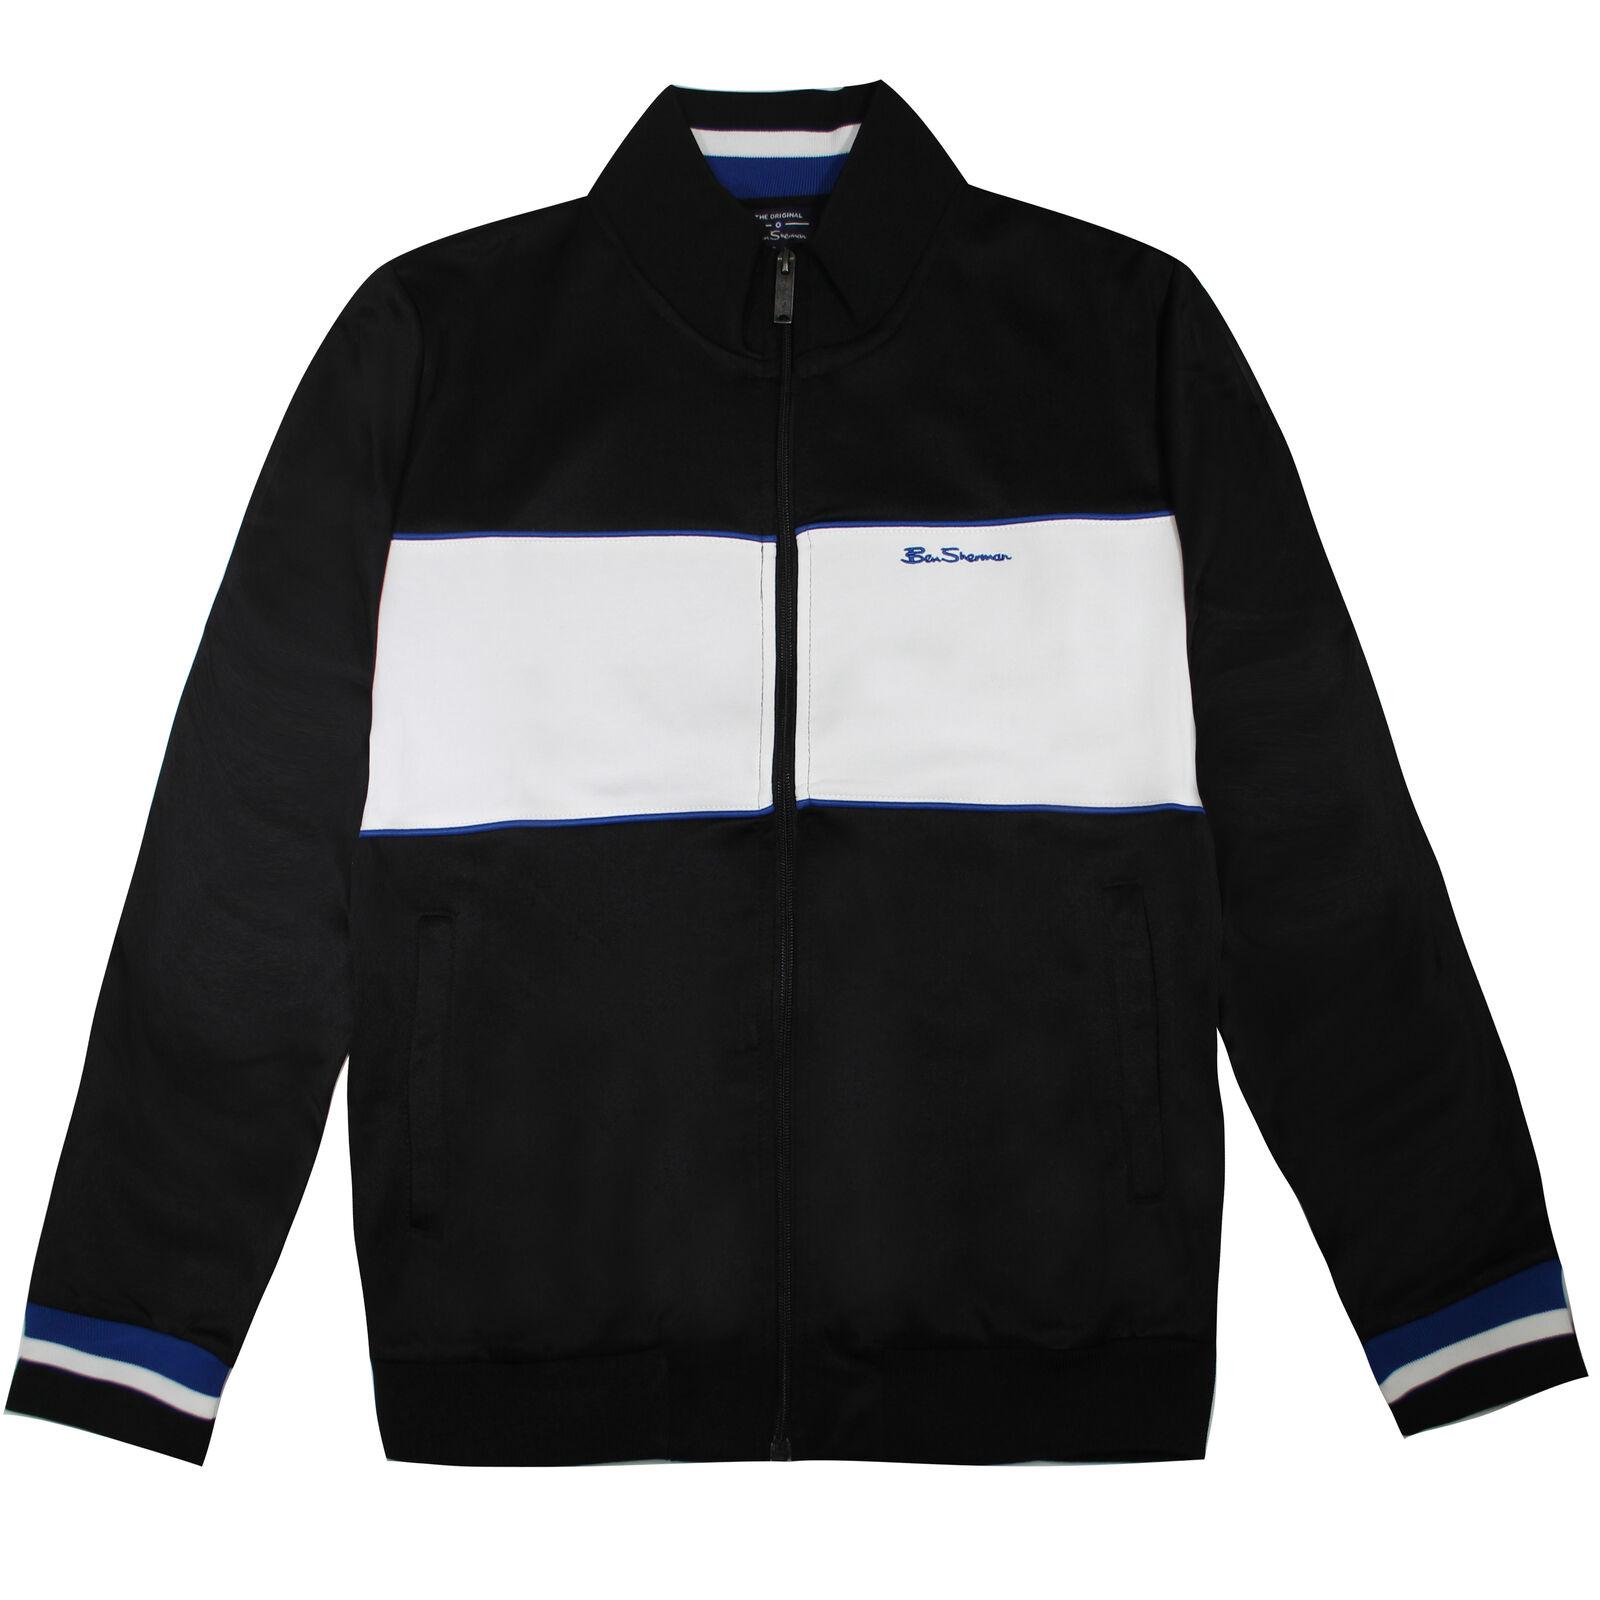 Ben Sherman Striped Panelled Mens Full Zip Track Top Jacket 0065218 Black